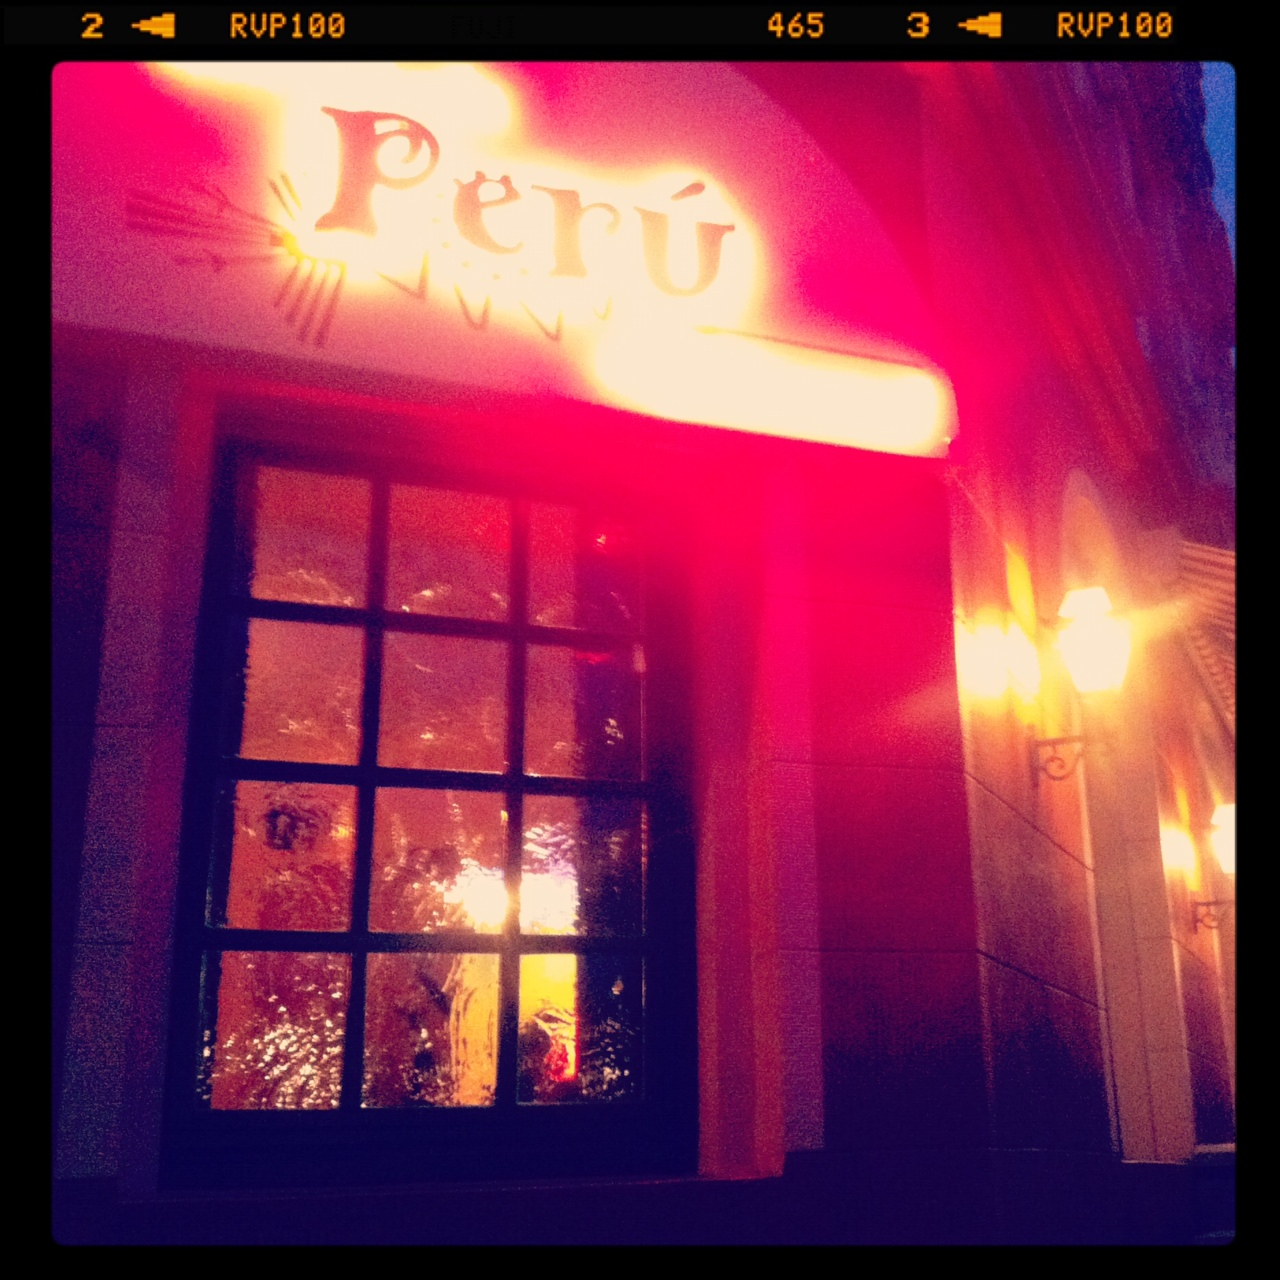 Me gusta la cocina peruana // Restaurante Perú deputamare in Bonn